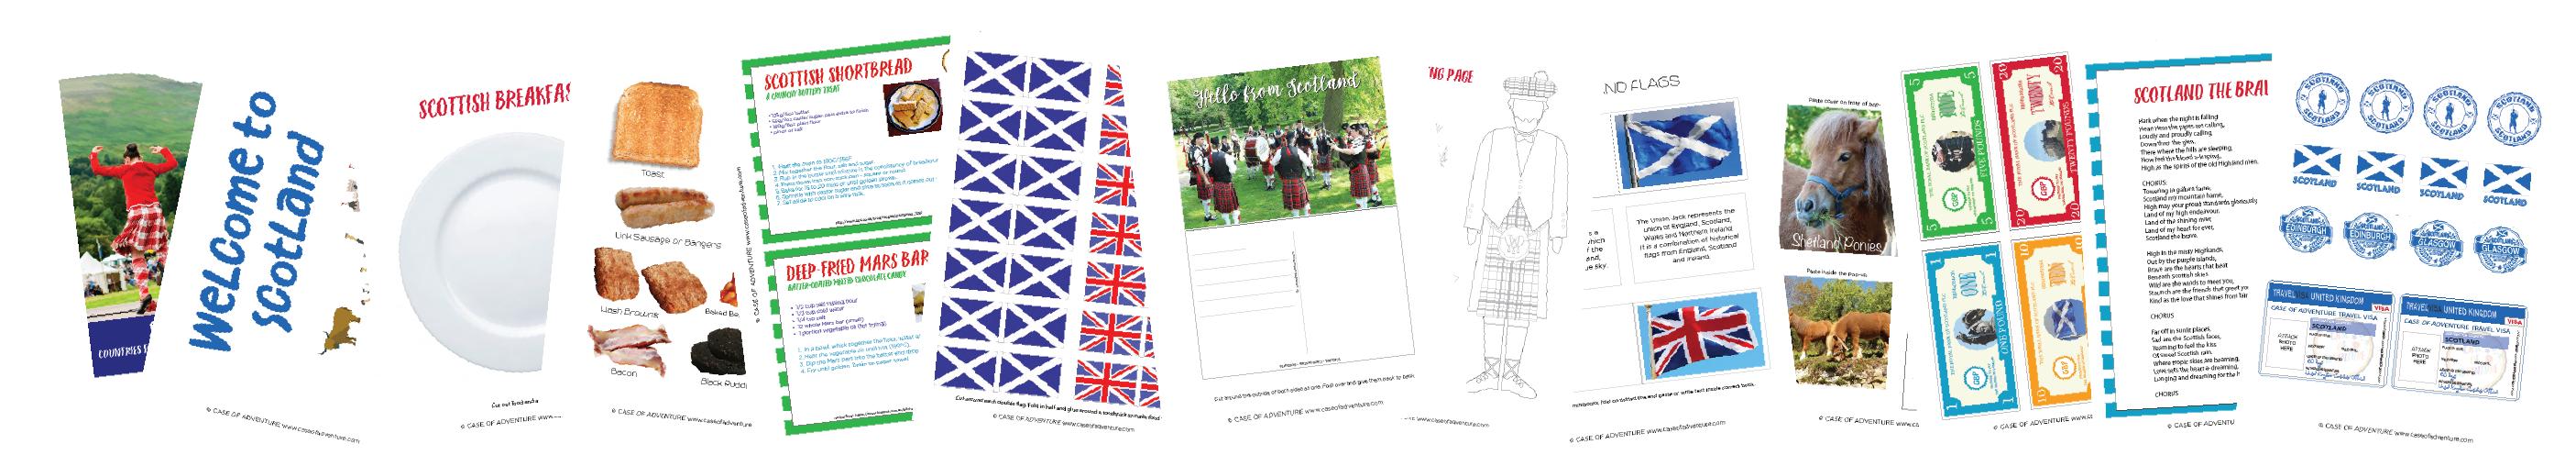 Scotland for Kids Free Printable Pack - Case of Adventure .com